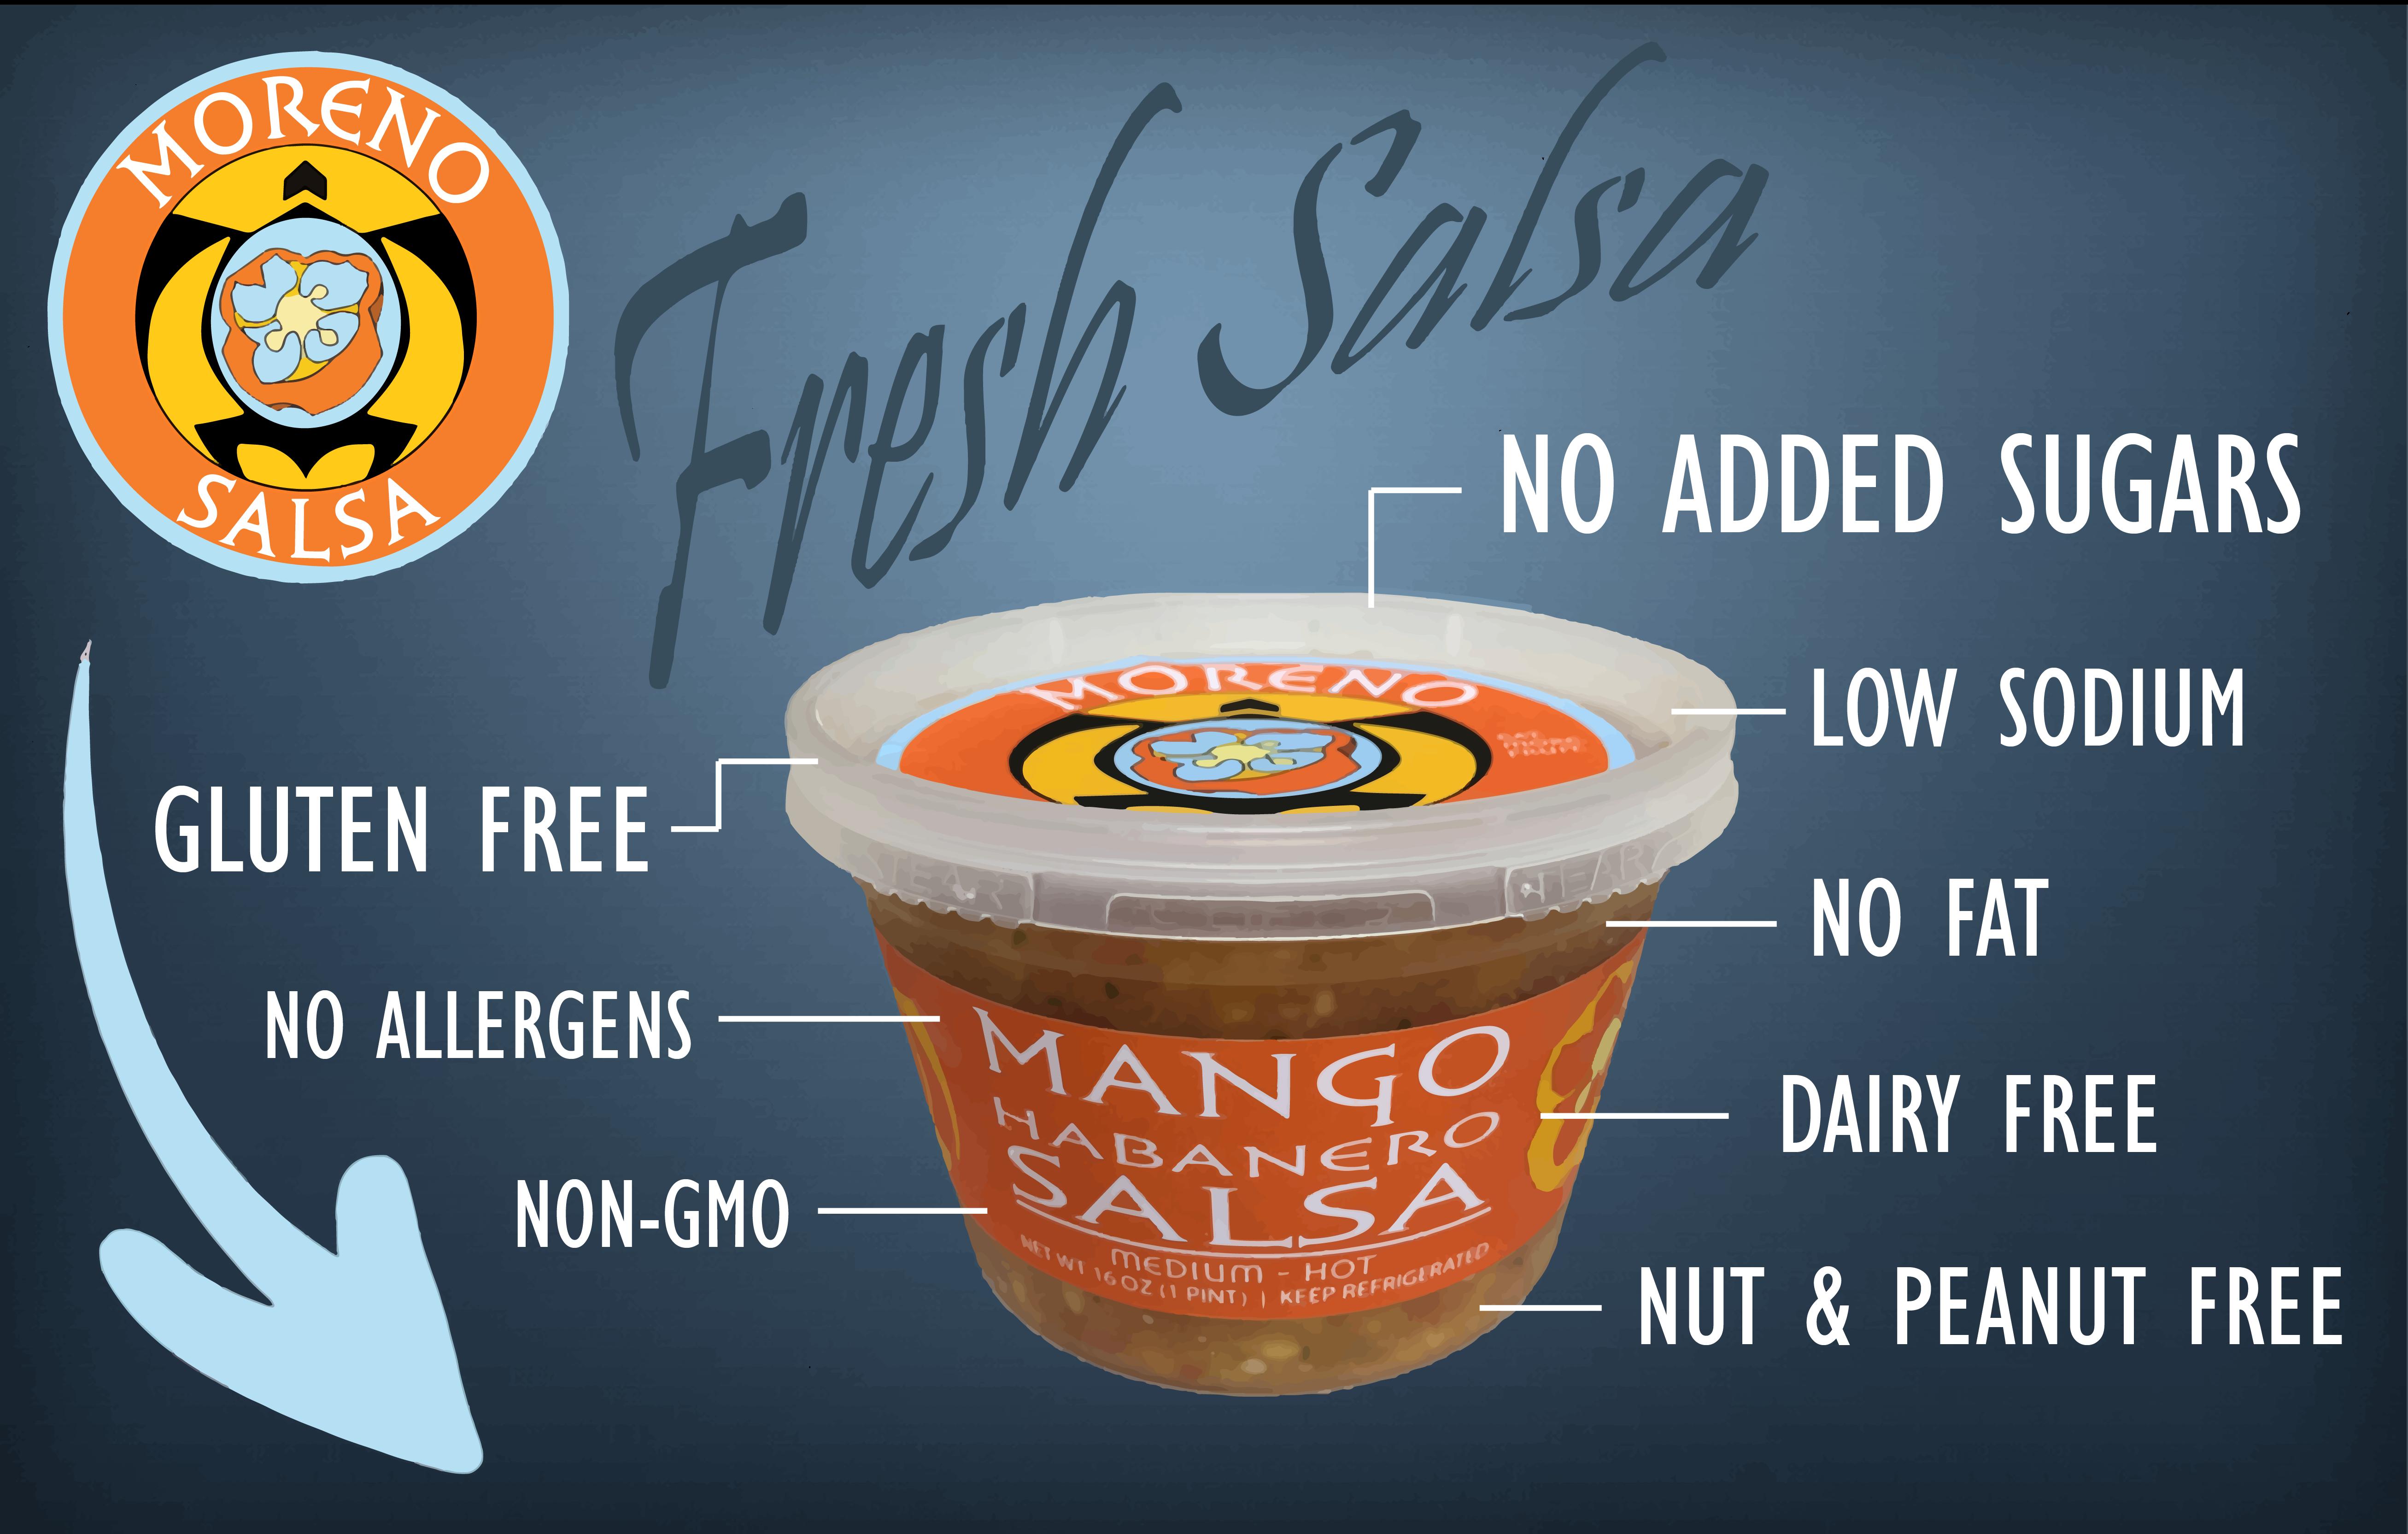 Mango Habanero salsa 2